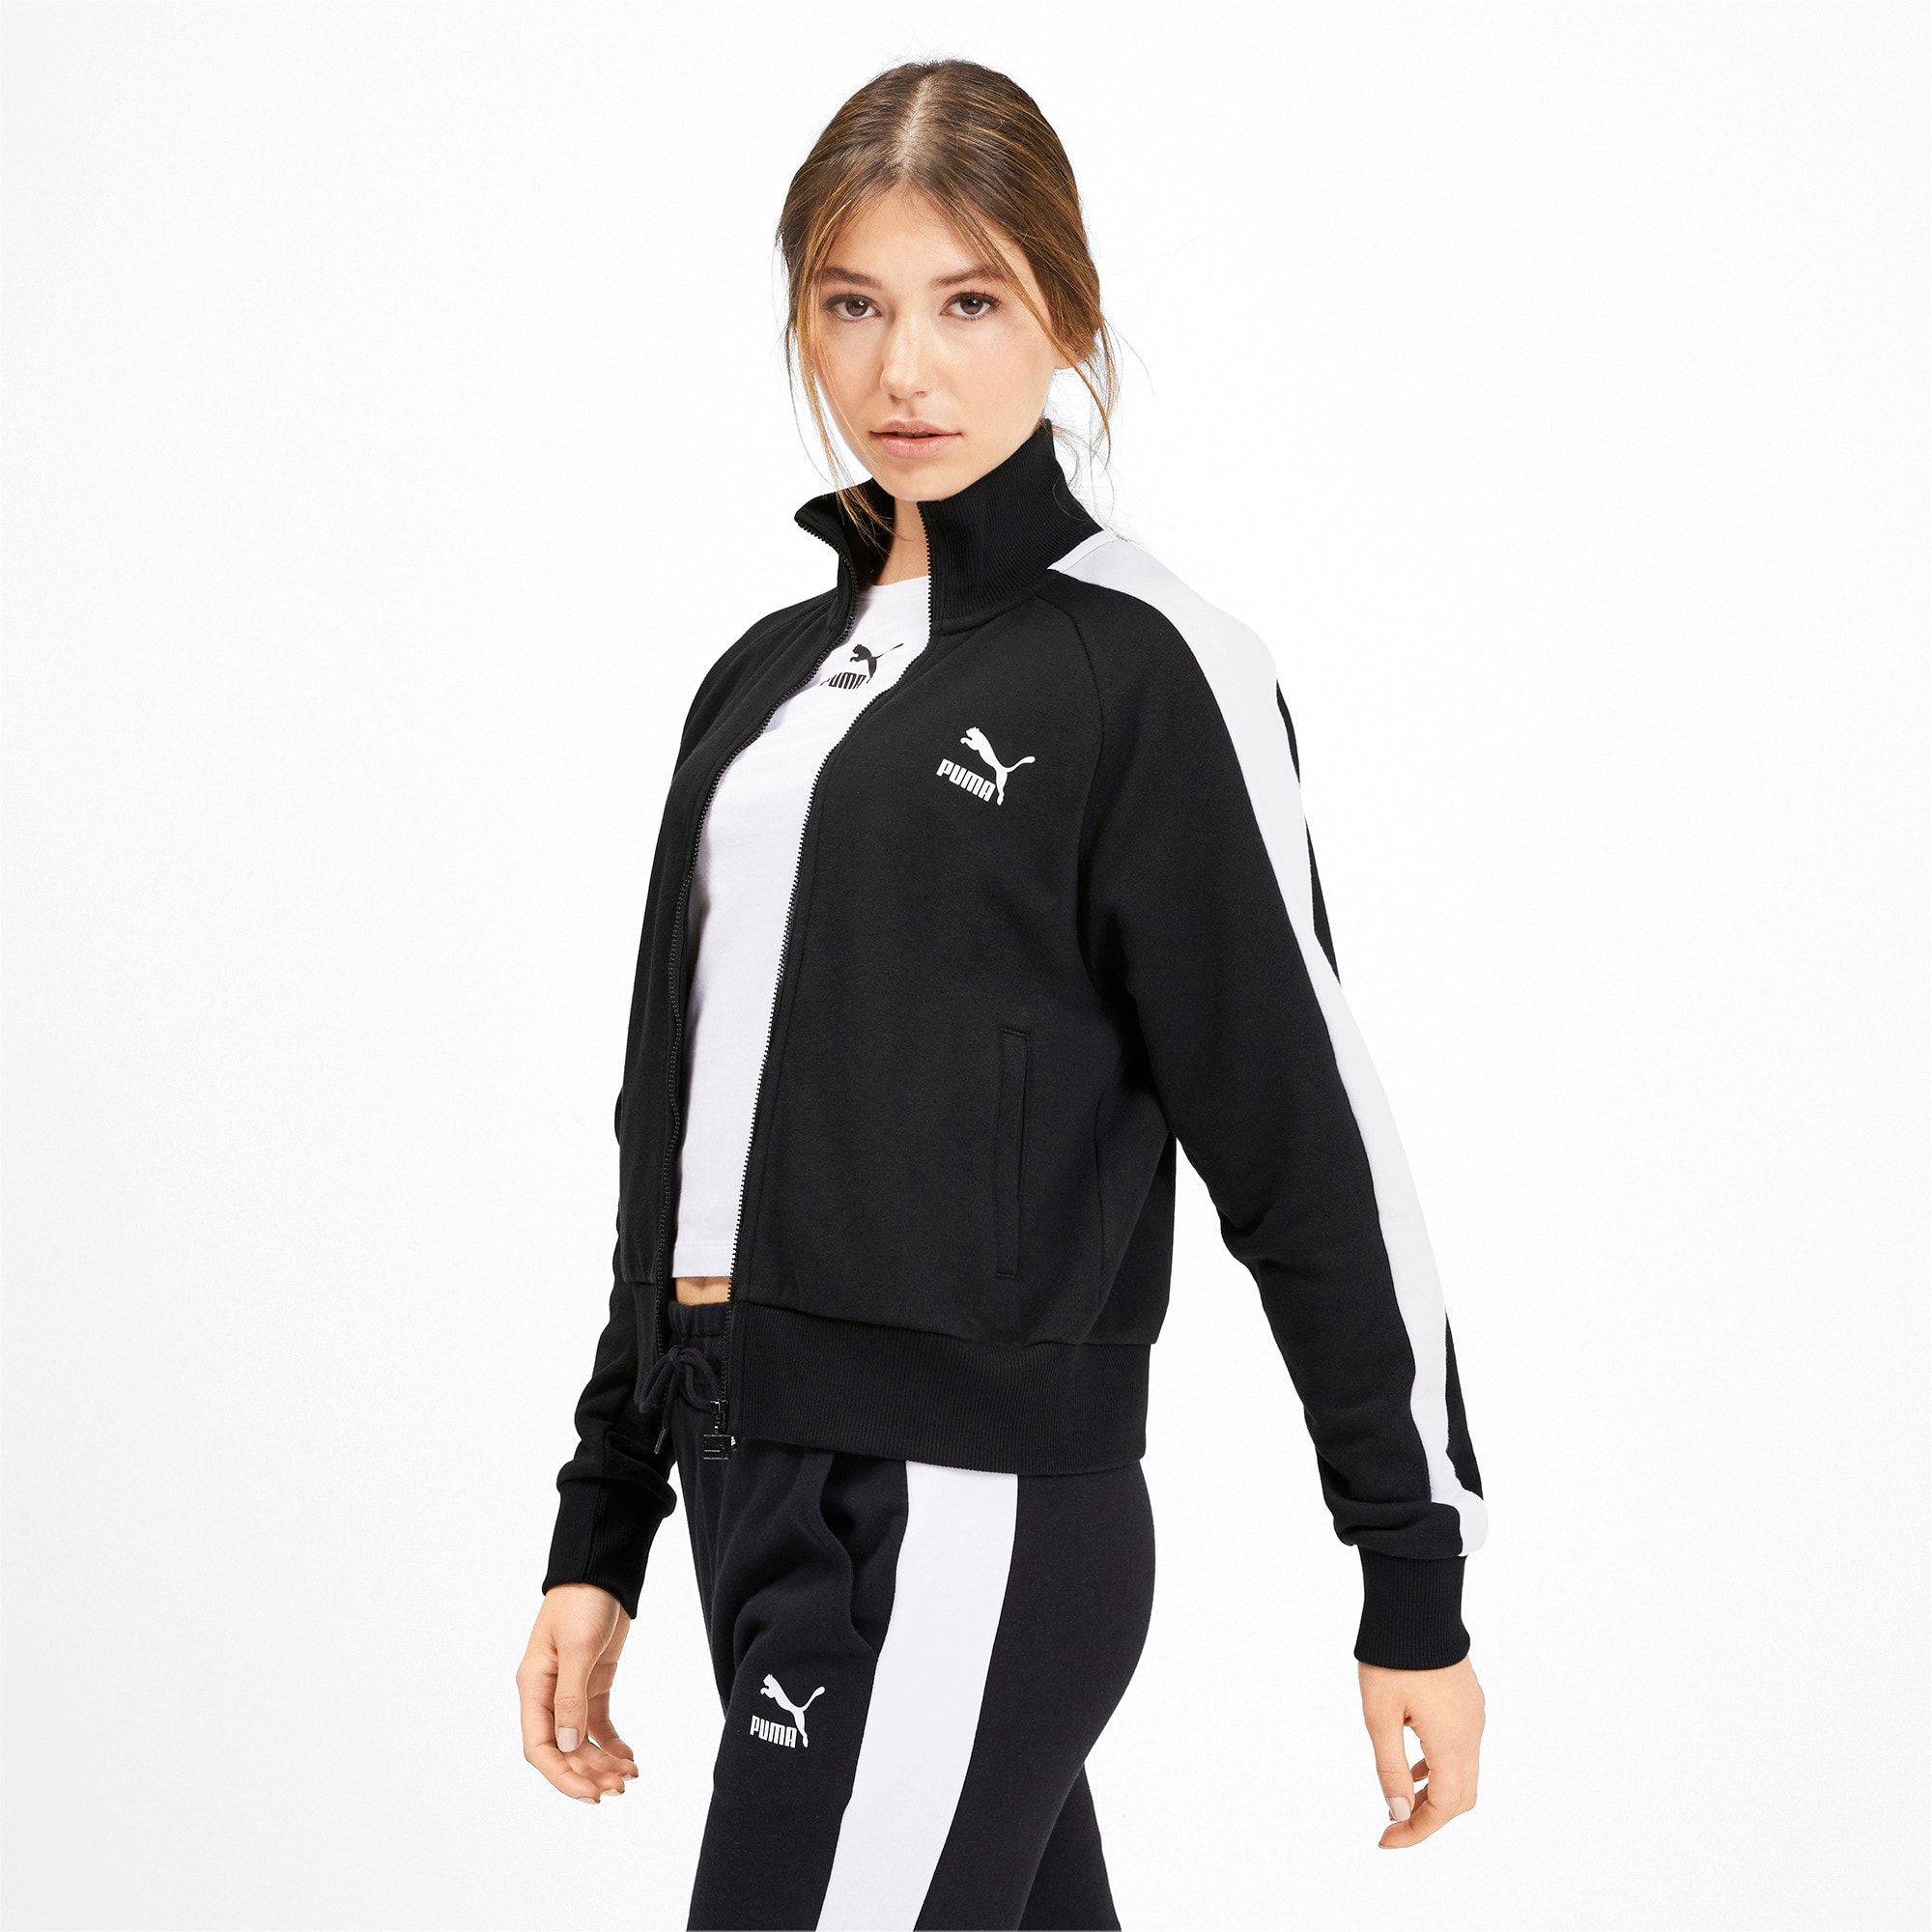 Thumbnail 2 of Classics T7 Women's Track Jacket, Puma Black, medium